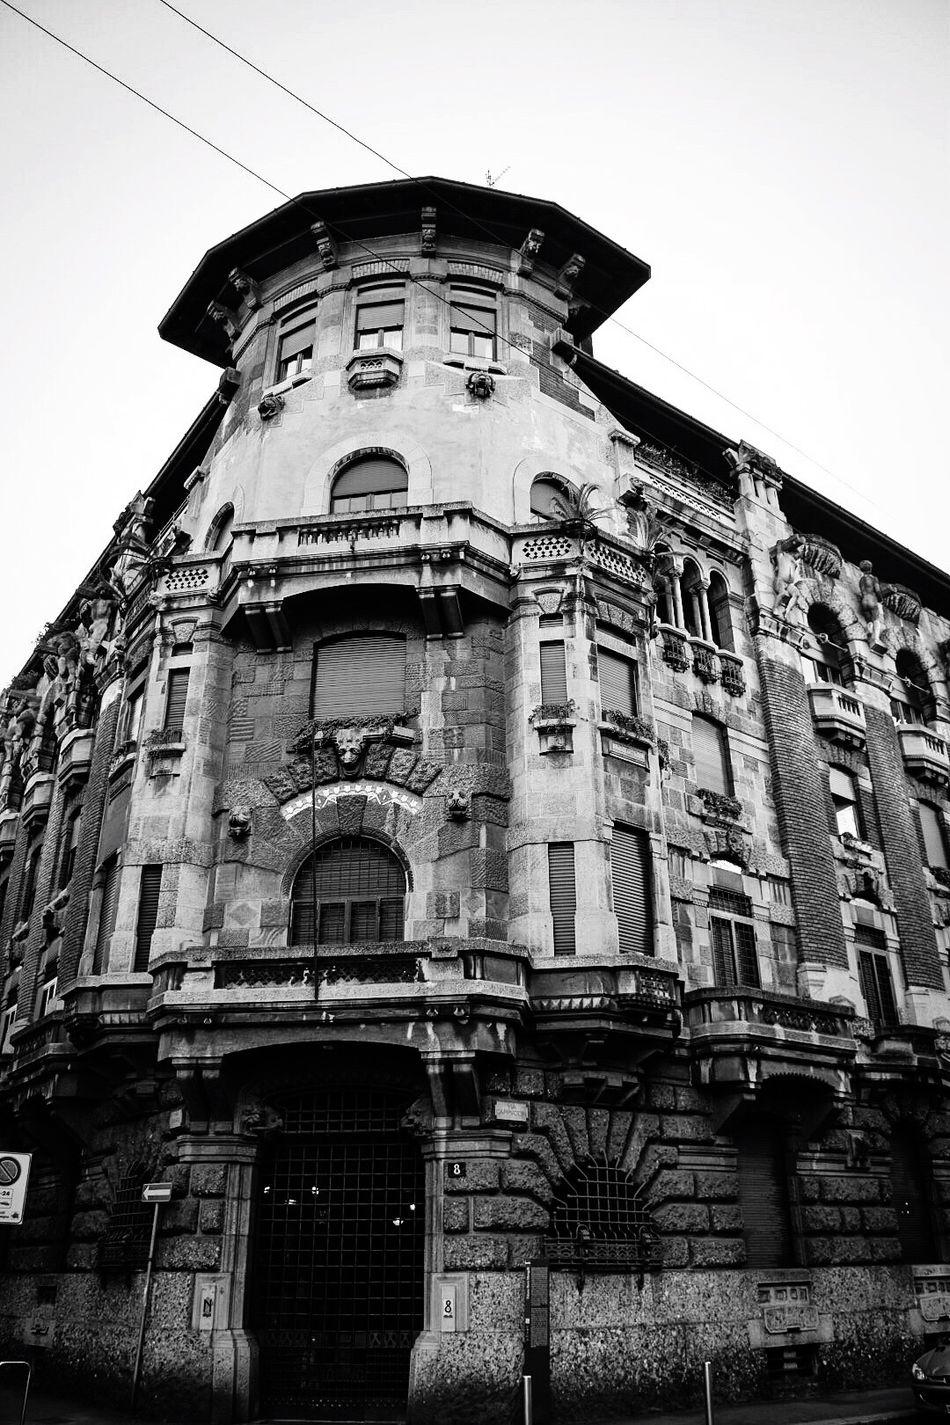 Palazzo Berri Meregalli, Milano Architecture Low Angle View Built Structure Eclectic 1913 Urbanphotography Blackandwhite Architecture_collection Milano